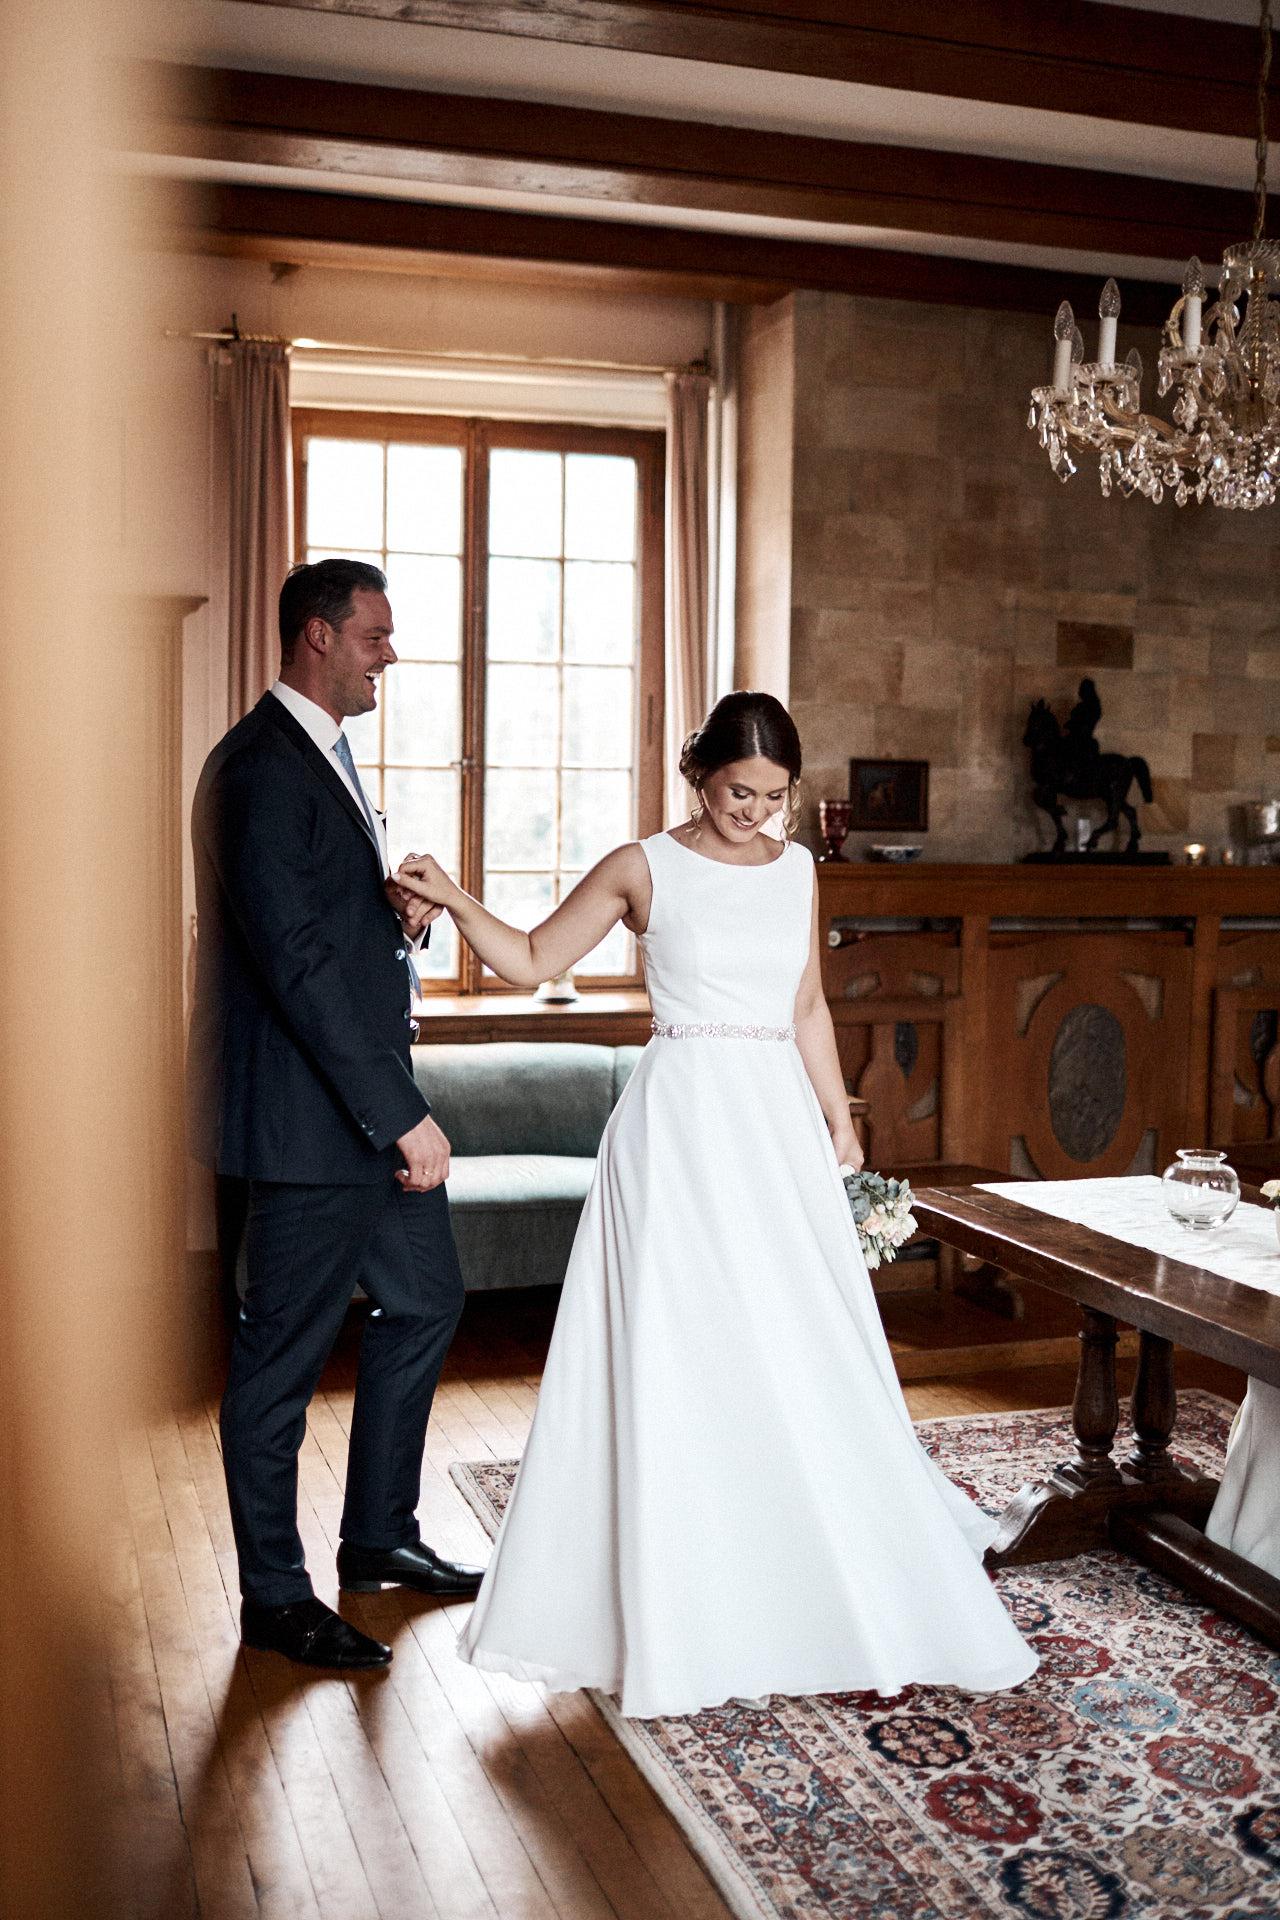 2019-12-20 Laura & Robin - Alena and Daniel Weddings 0204